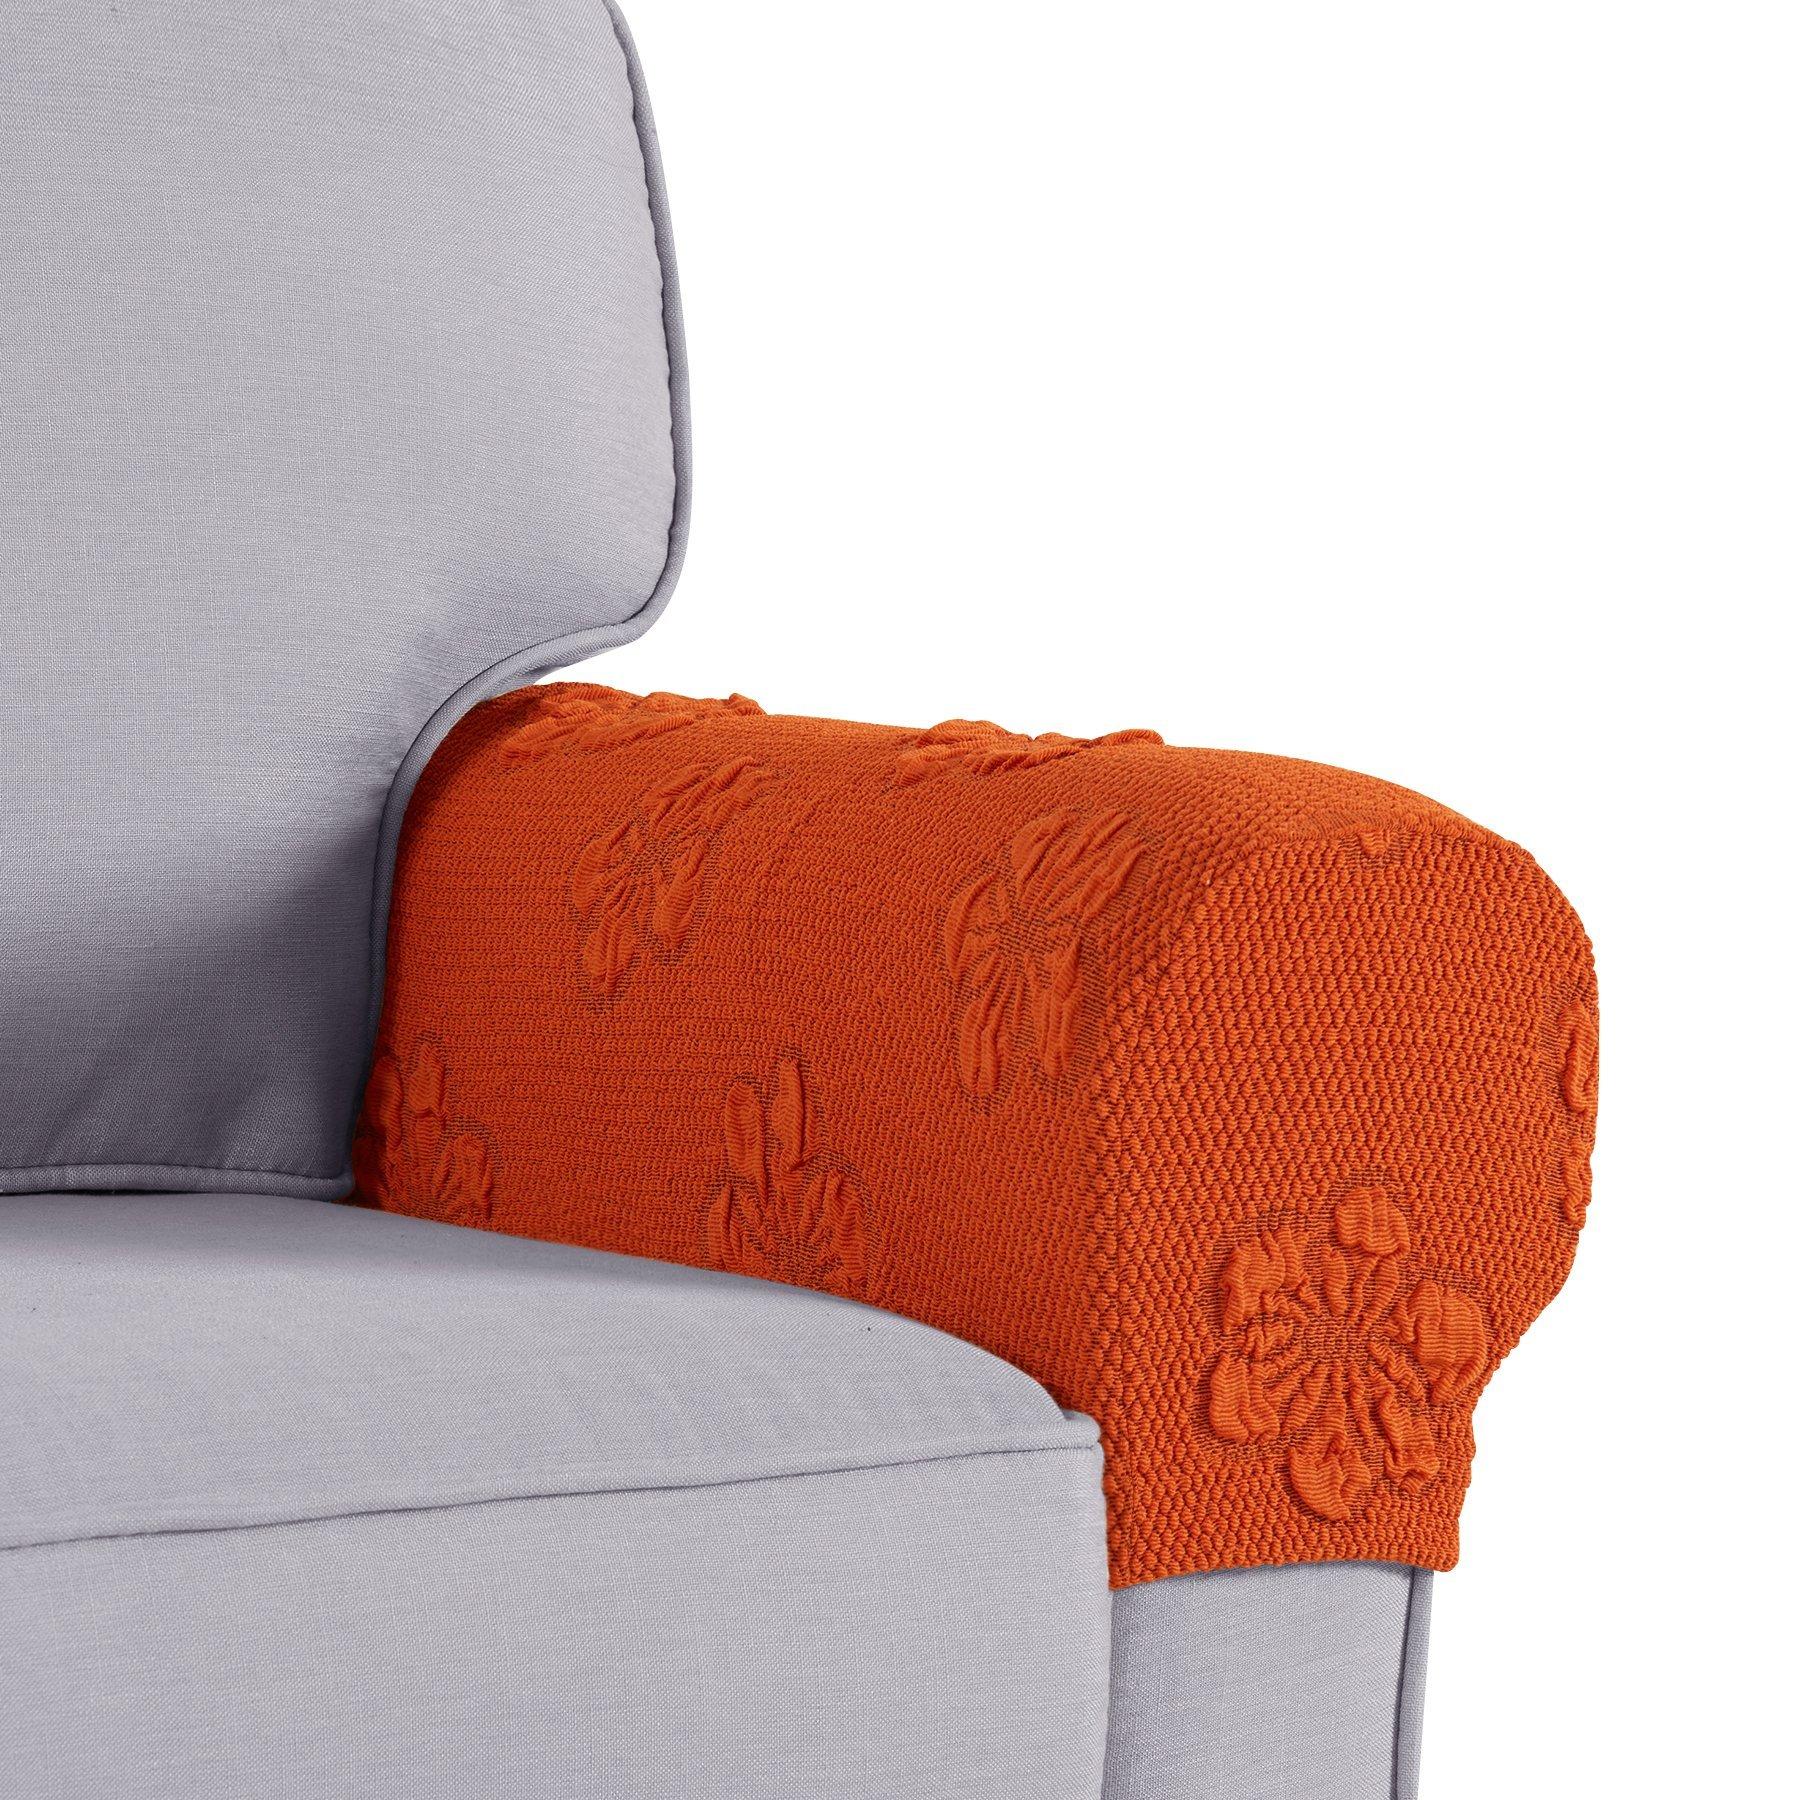 Joywell Spandex Stretch Armrest Covers Set of 2 (Orange)